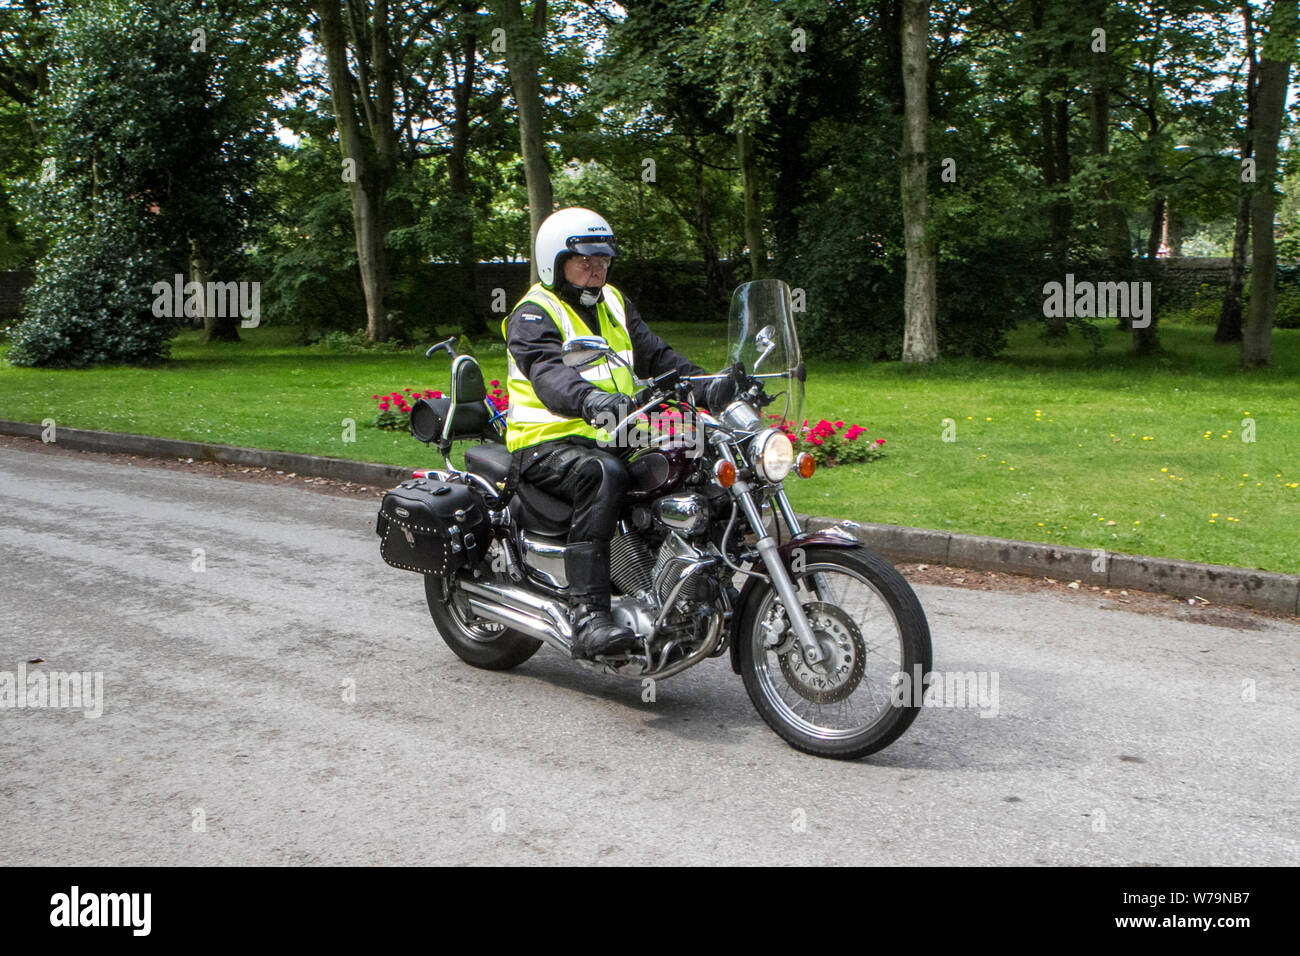 Yamaha Motorbike Show Stock Photos & Yamaha Motorbike Show